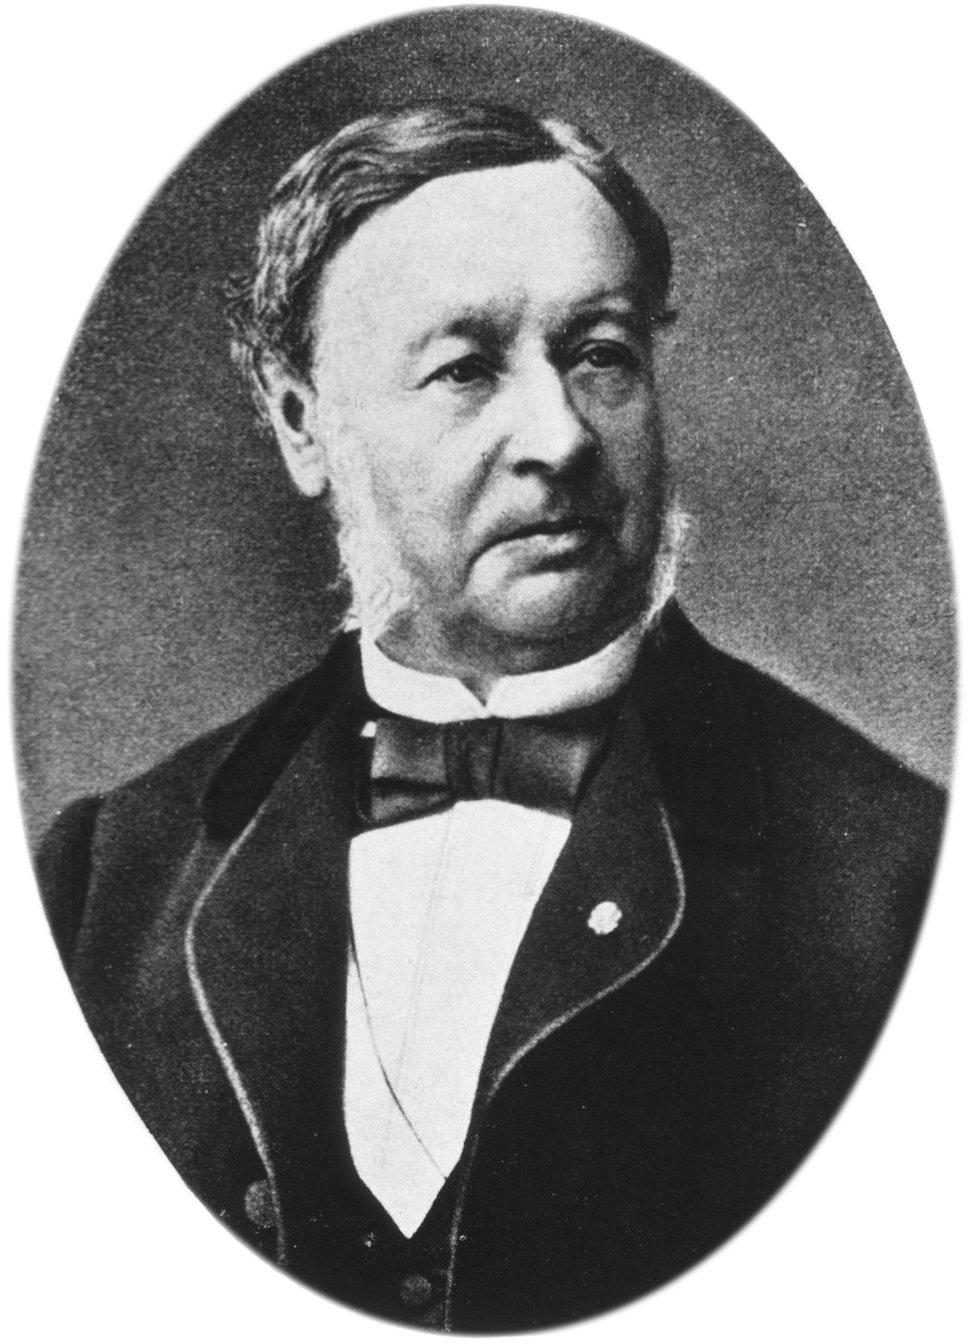 Depiction of Theodor Schwann